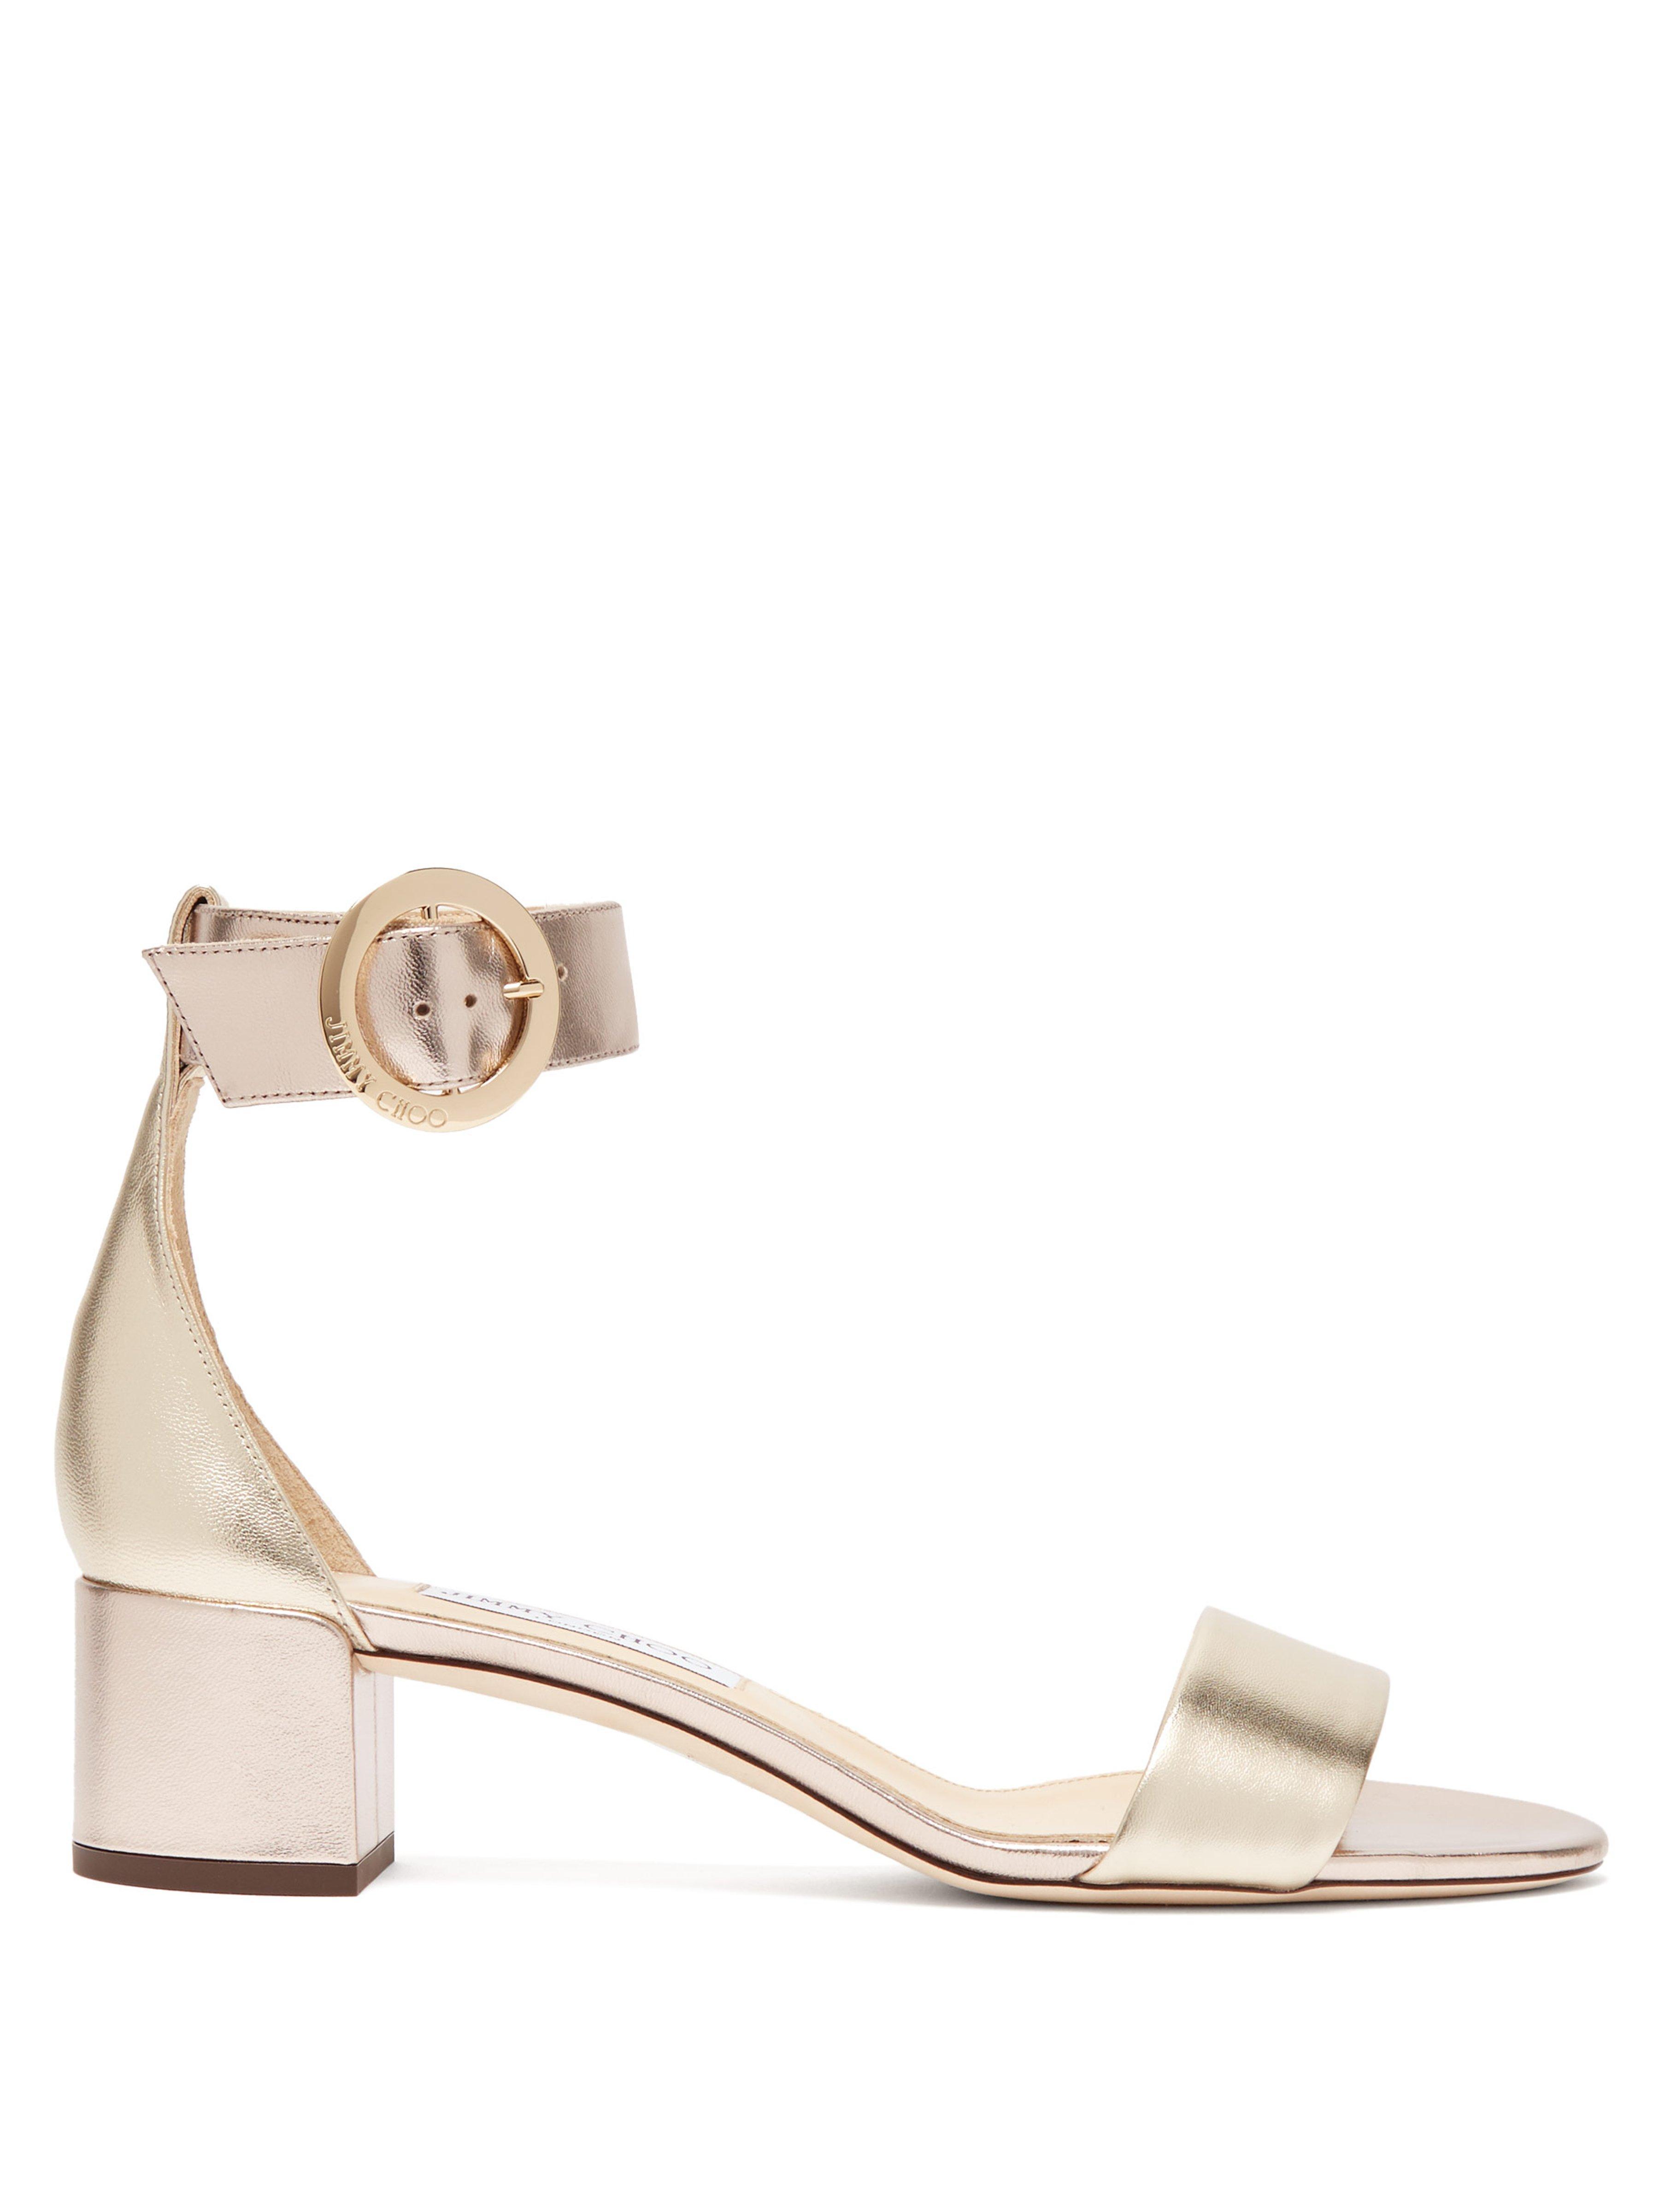 eed15093ba9 Jimmy Choo Jaimie Block Heel Metallic Leather Sandals in Metallic - Lyst